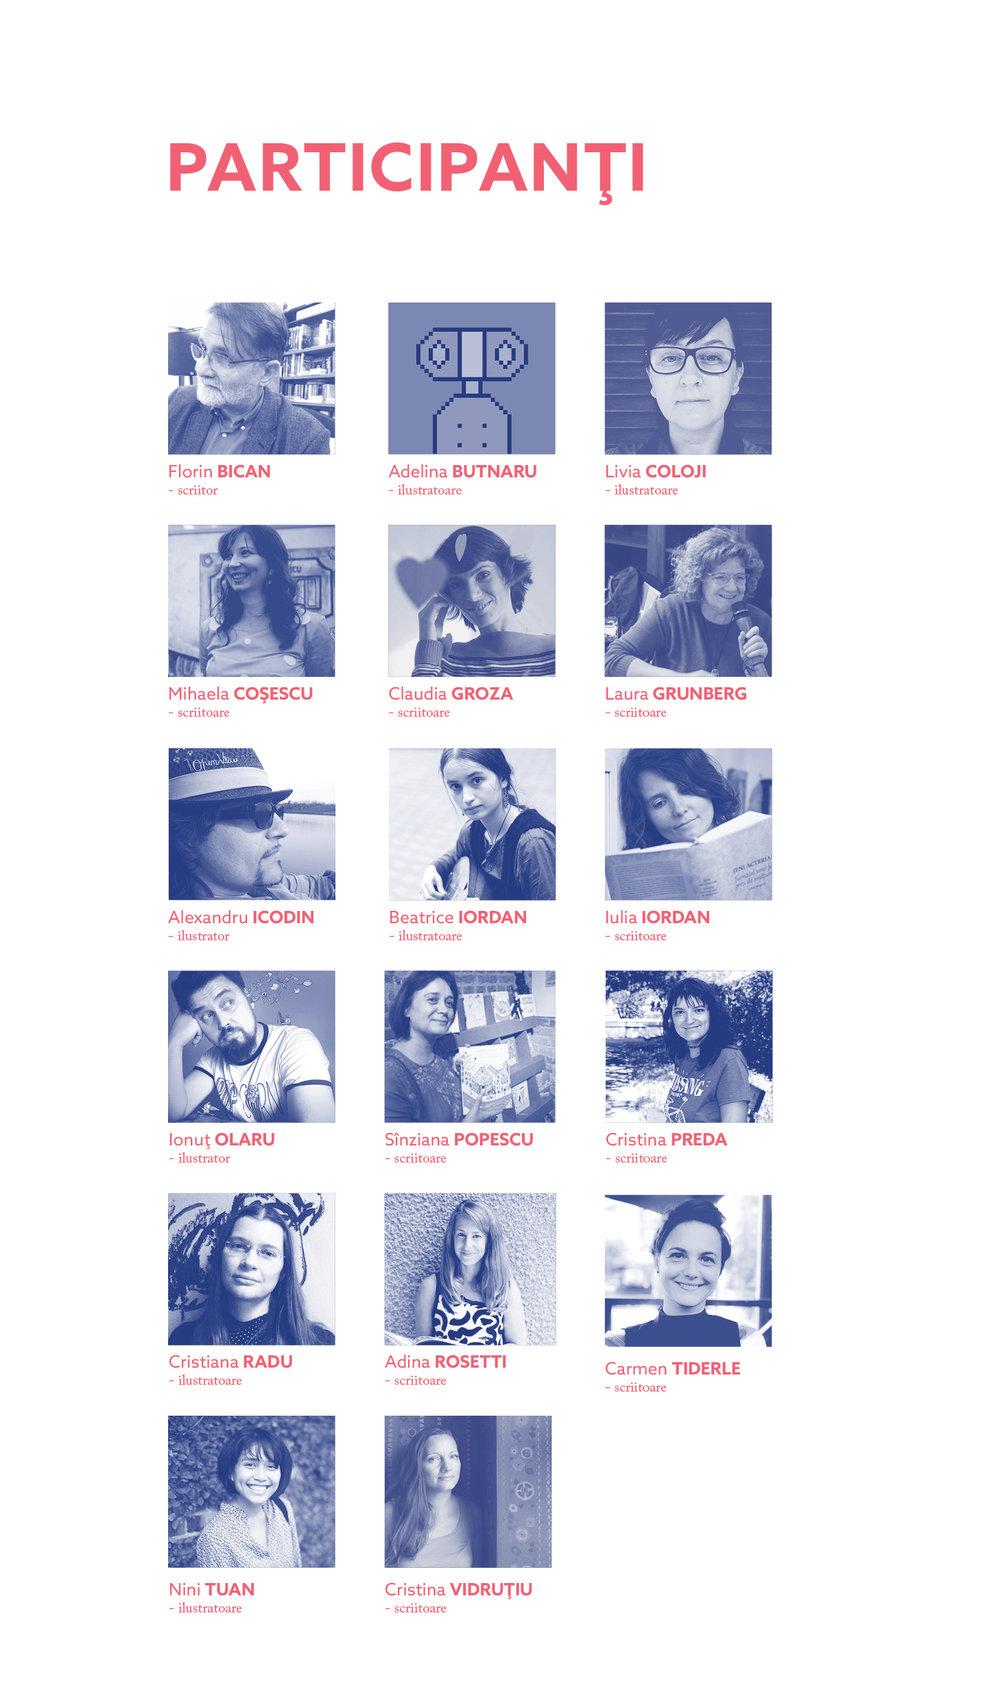 Participanti.jpg